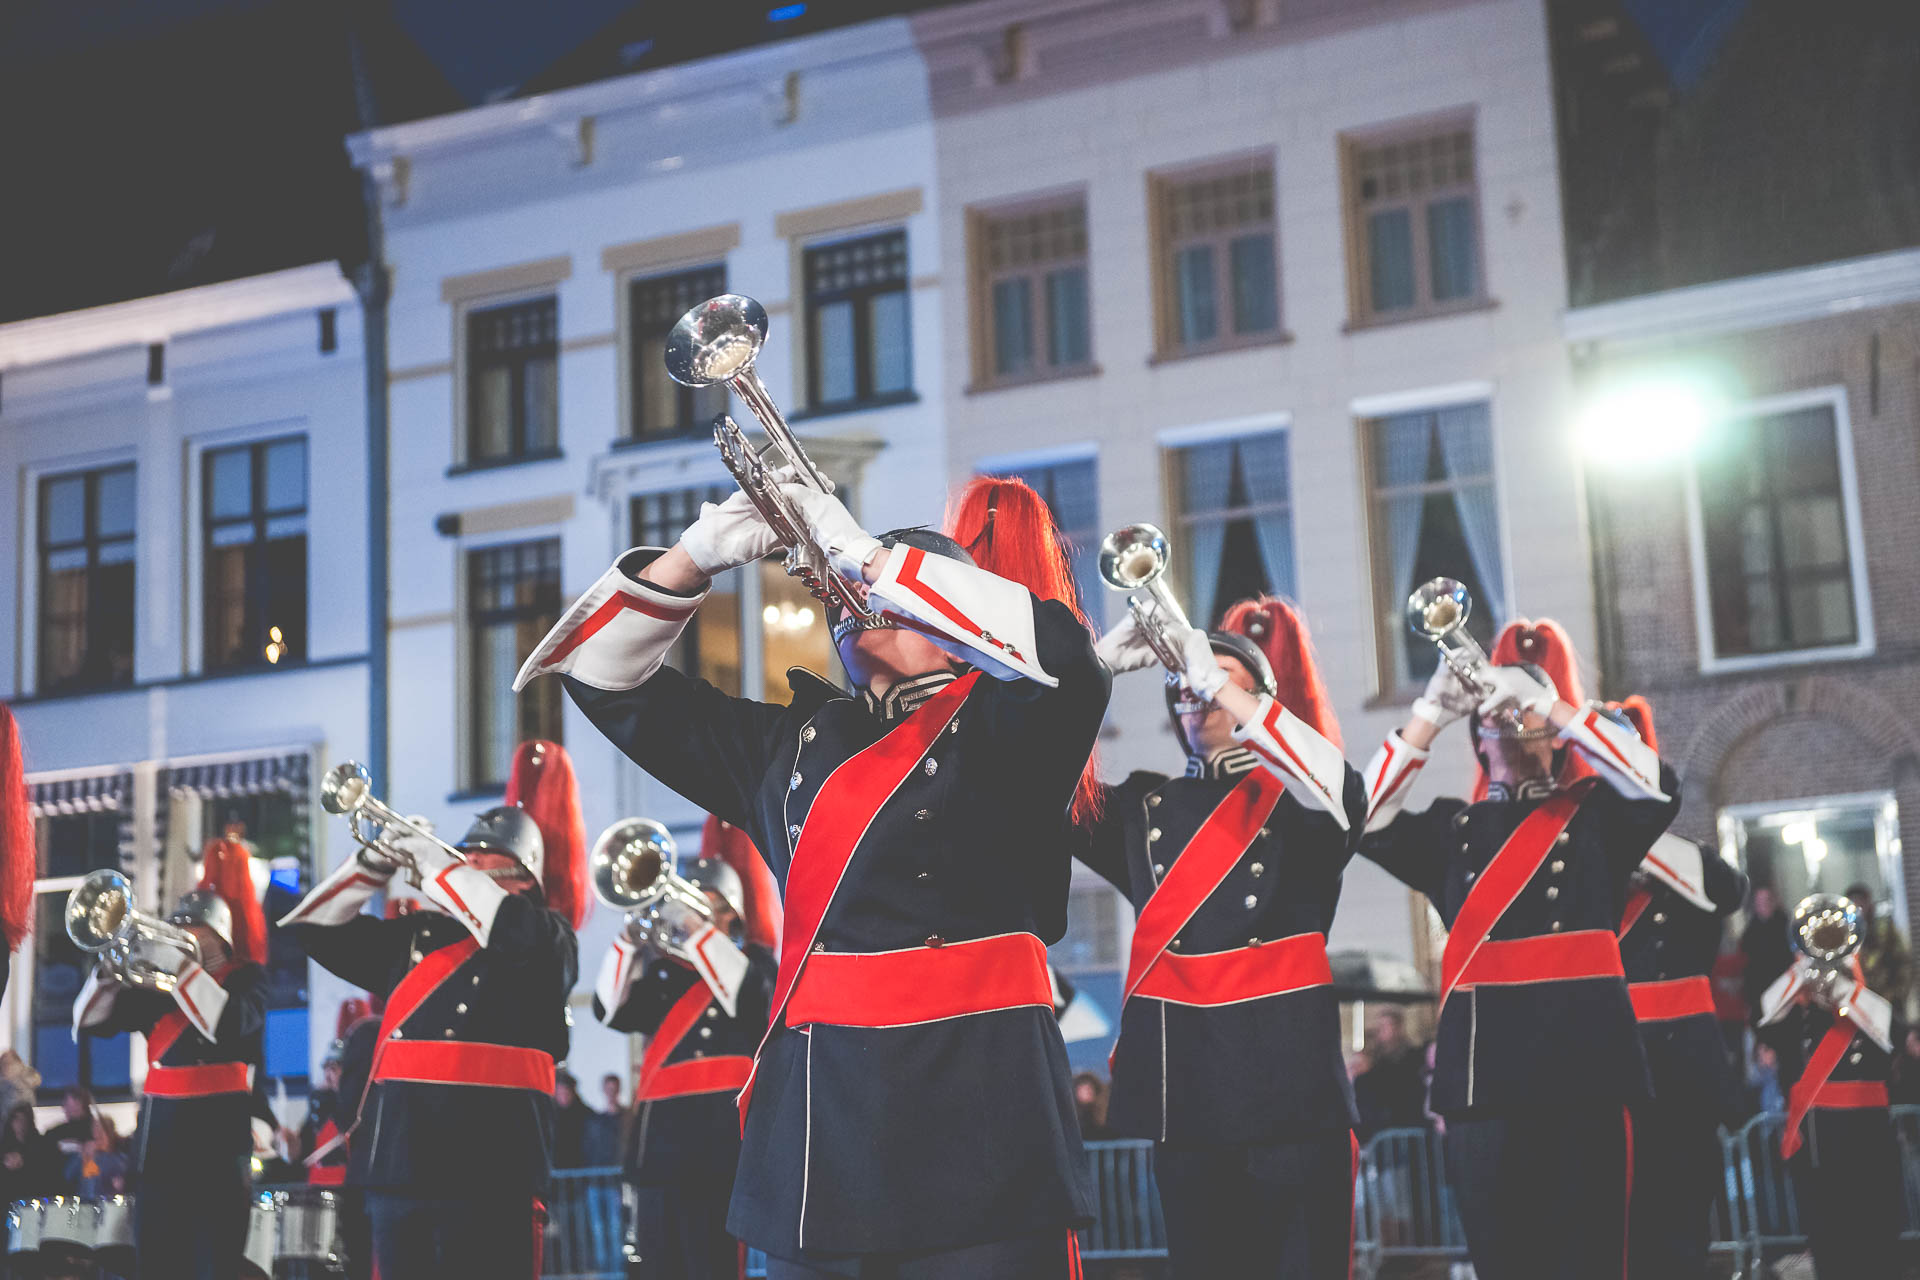 Kamper Trompetter Korps | Event | opening | theater | show | fotograaf | fotografie © fotografiecor.nl